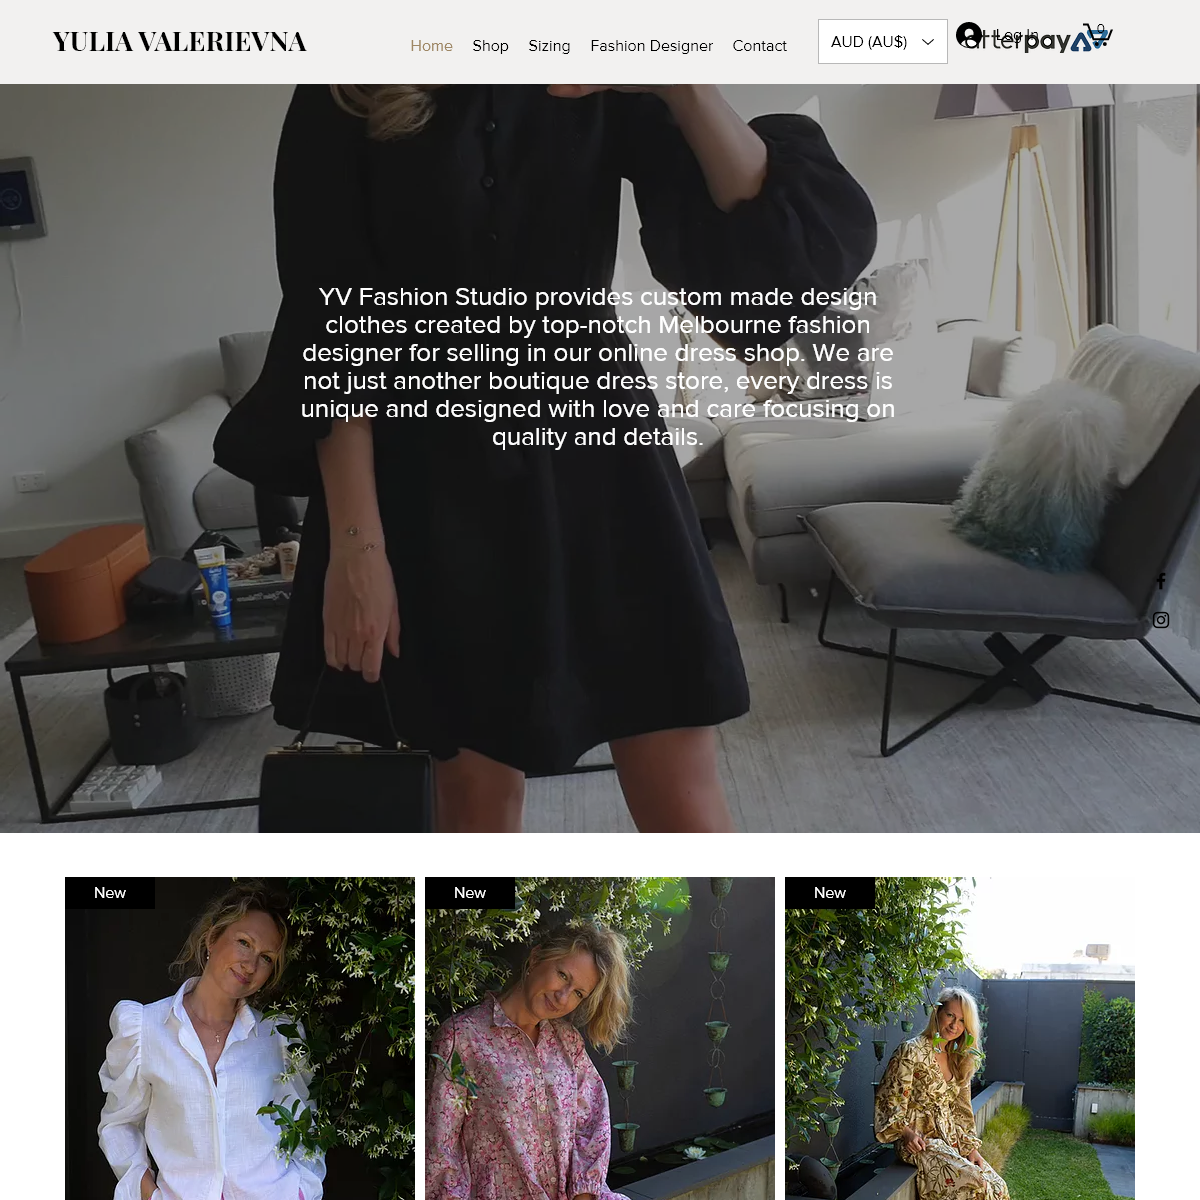 Fancy Dress Store - YV Fashion Studio - Australia